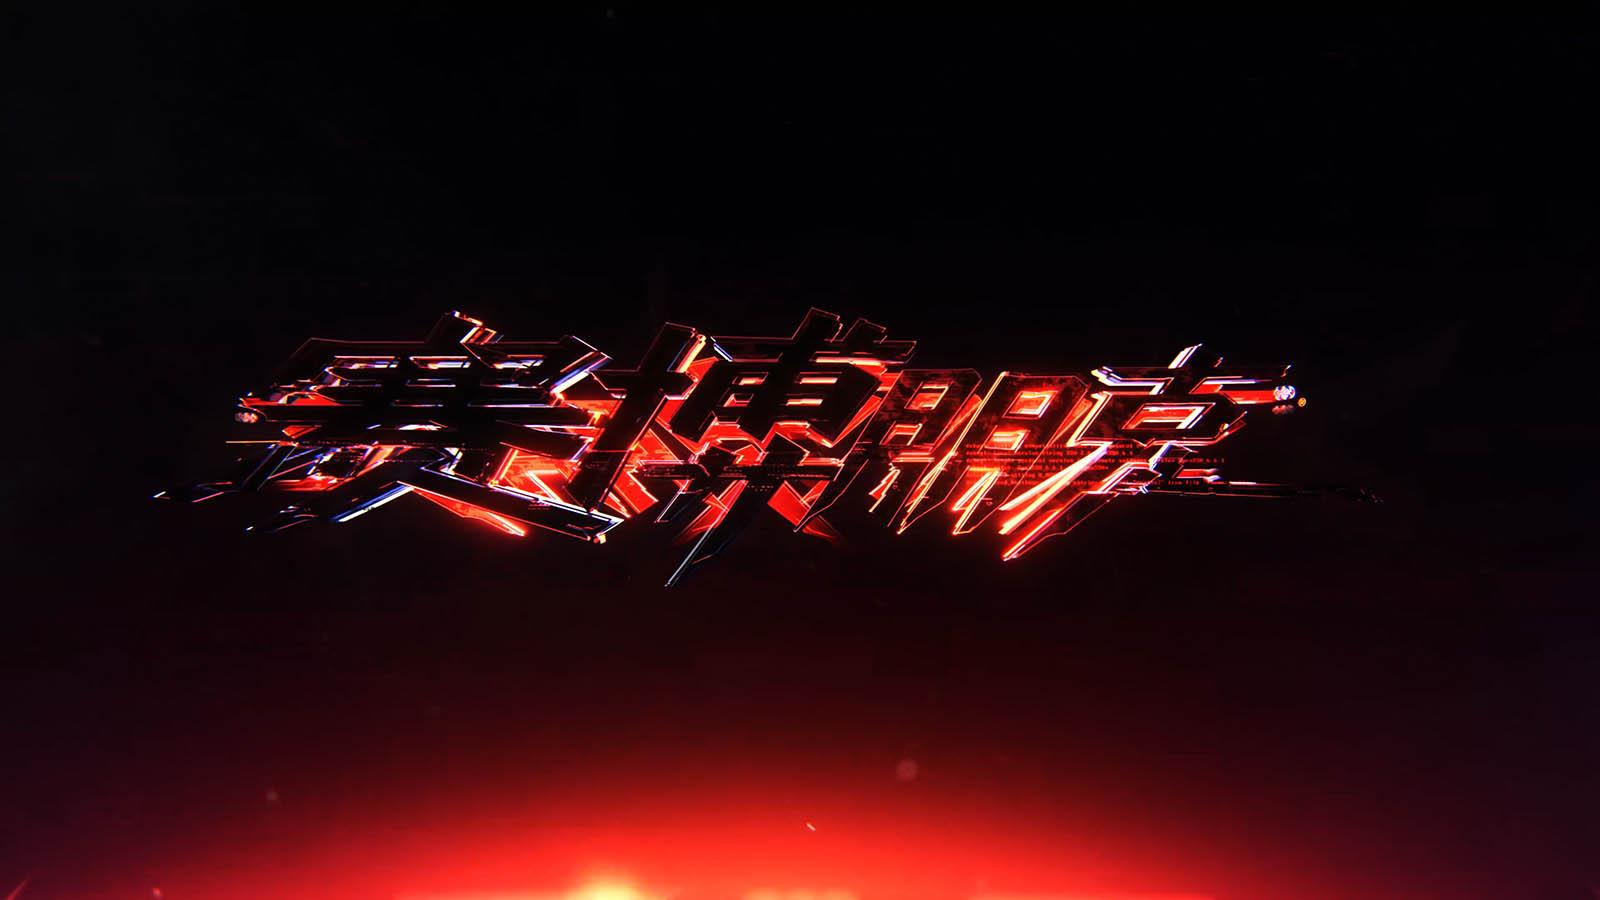 Cyberpunk_LogoSting_TerritoryStudio_003